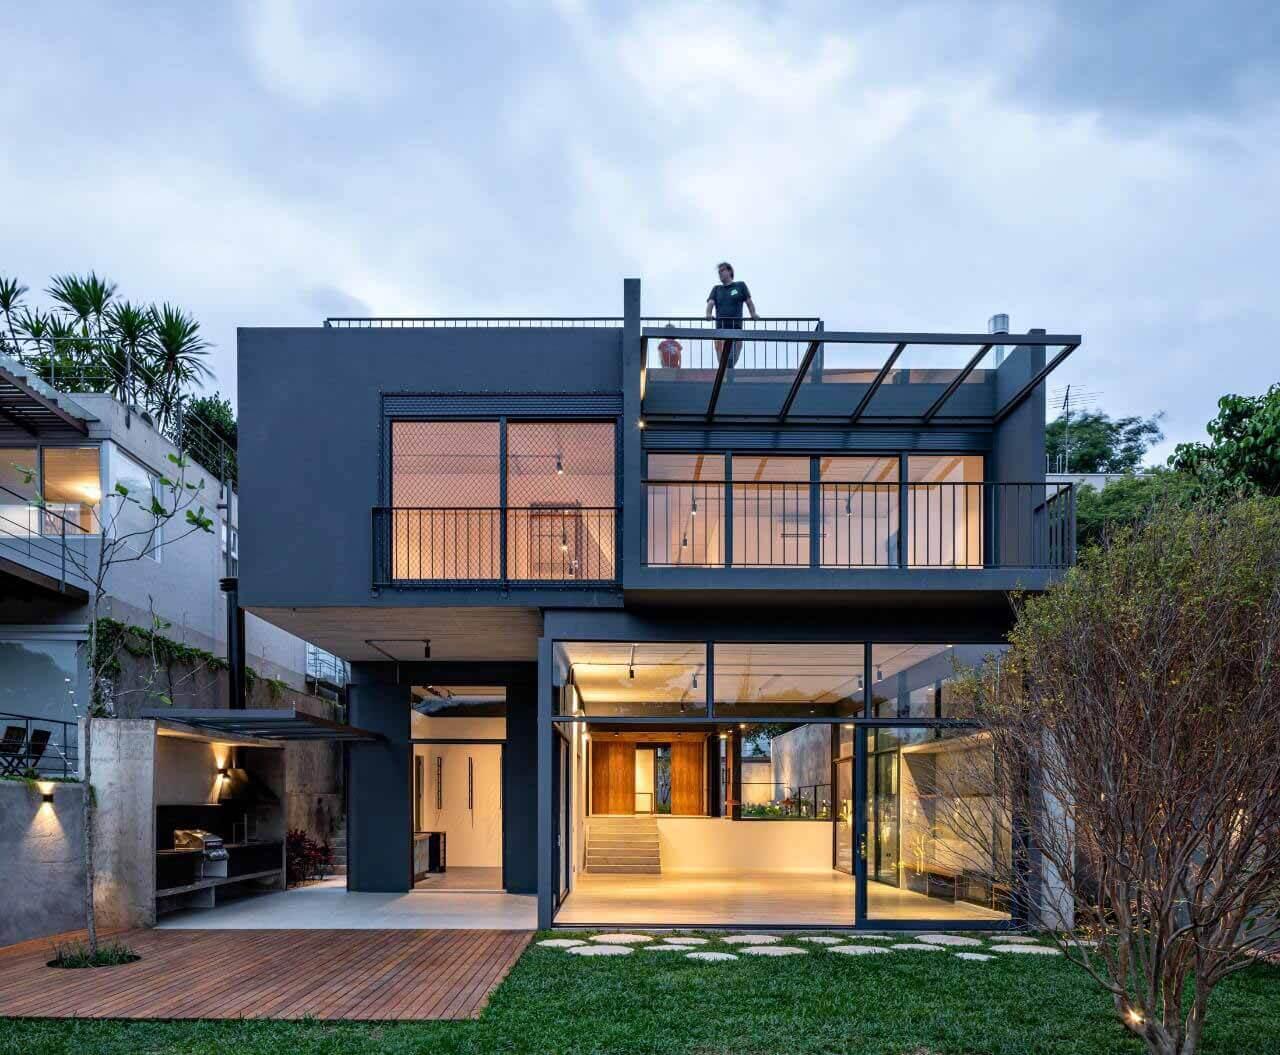 Casa Anunze / ARKITITO Arquitetura